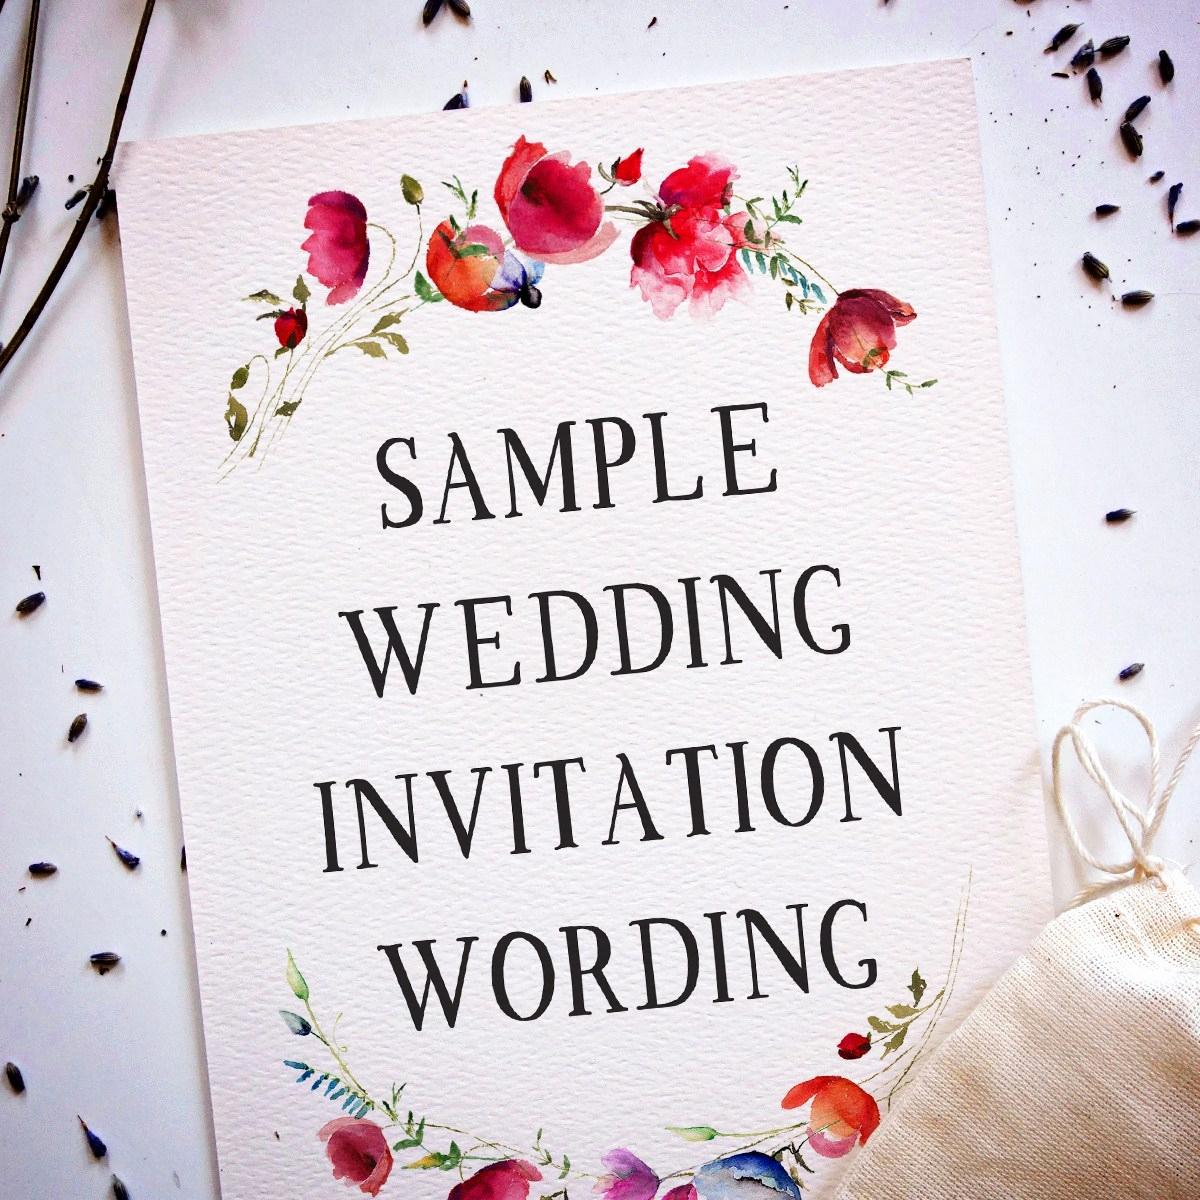 Wedding Invitation Card Ideas Inspirational Wedding Wording Samples and Ideas for Indian Wedding